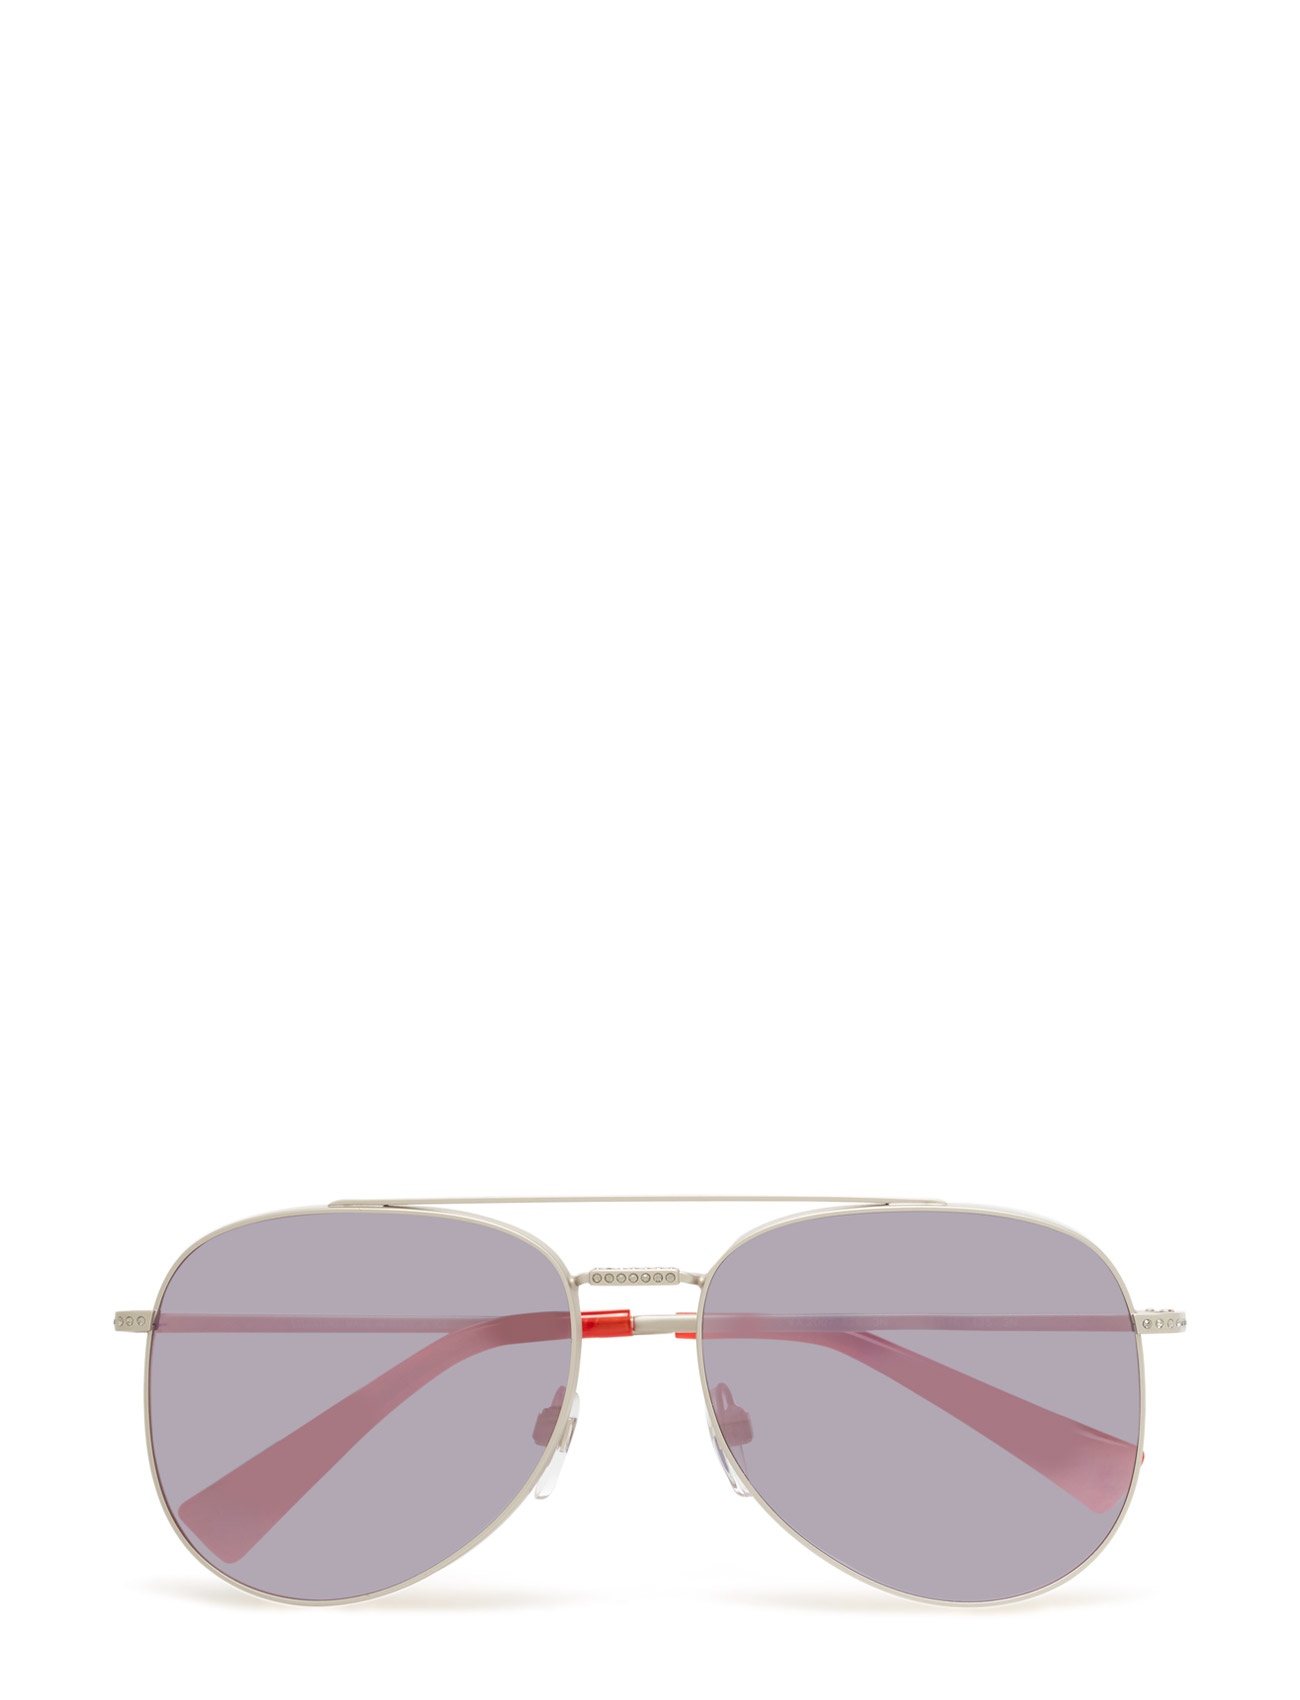 Glamtech - Valentino Sunglasses